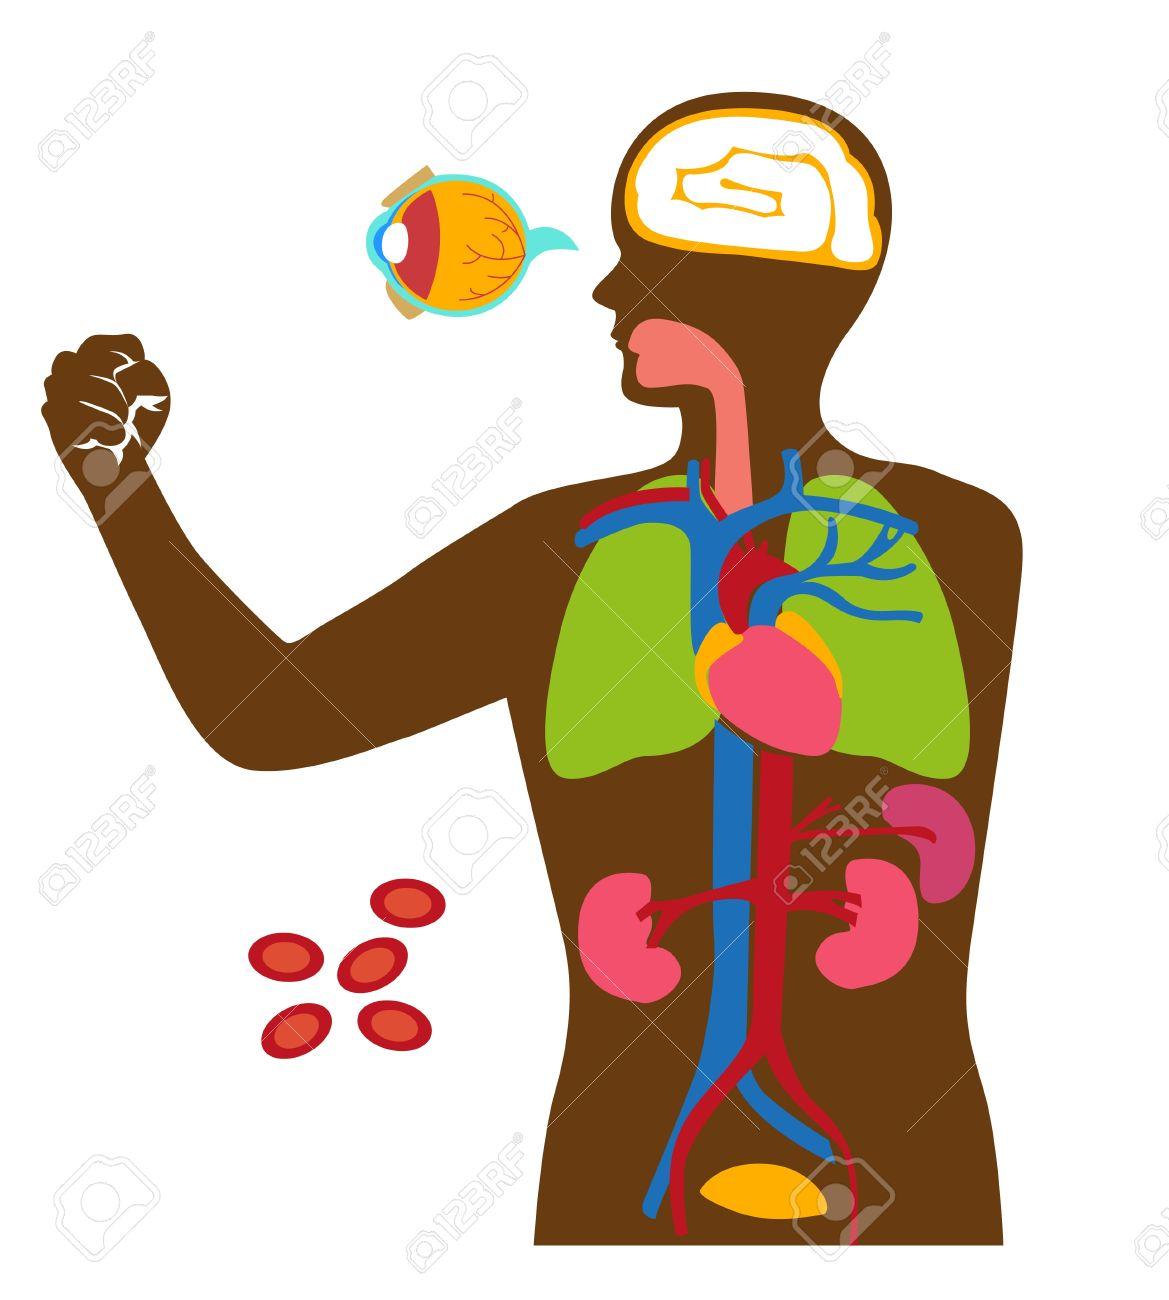 human organs clipart at getdrawings com free for personal use rh getdrawings com human eye clipart human clipart